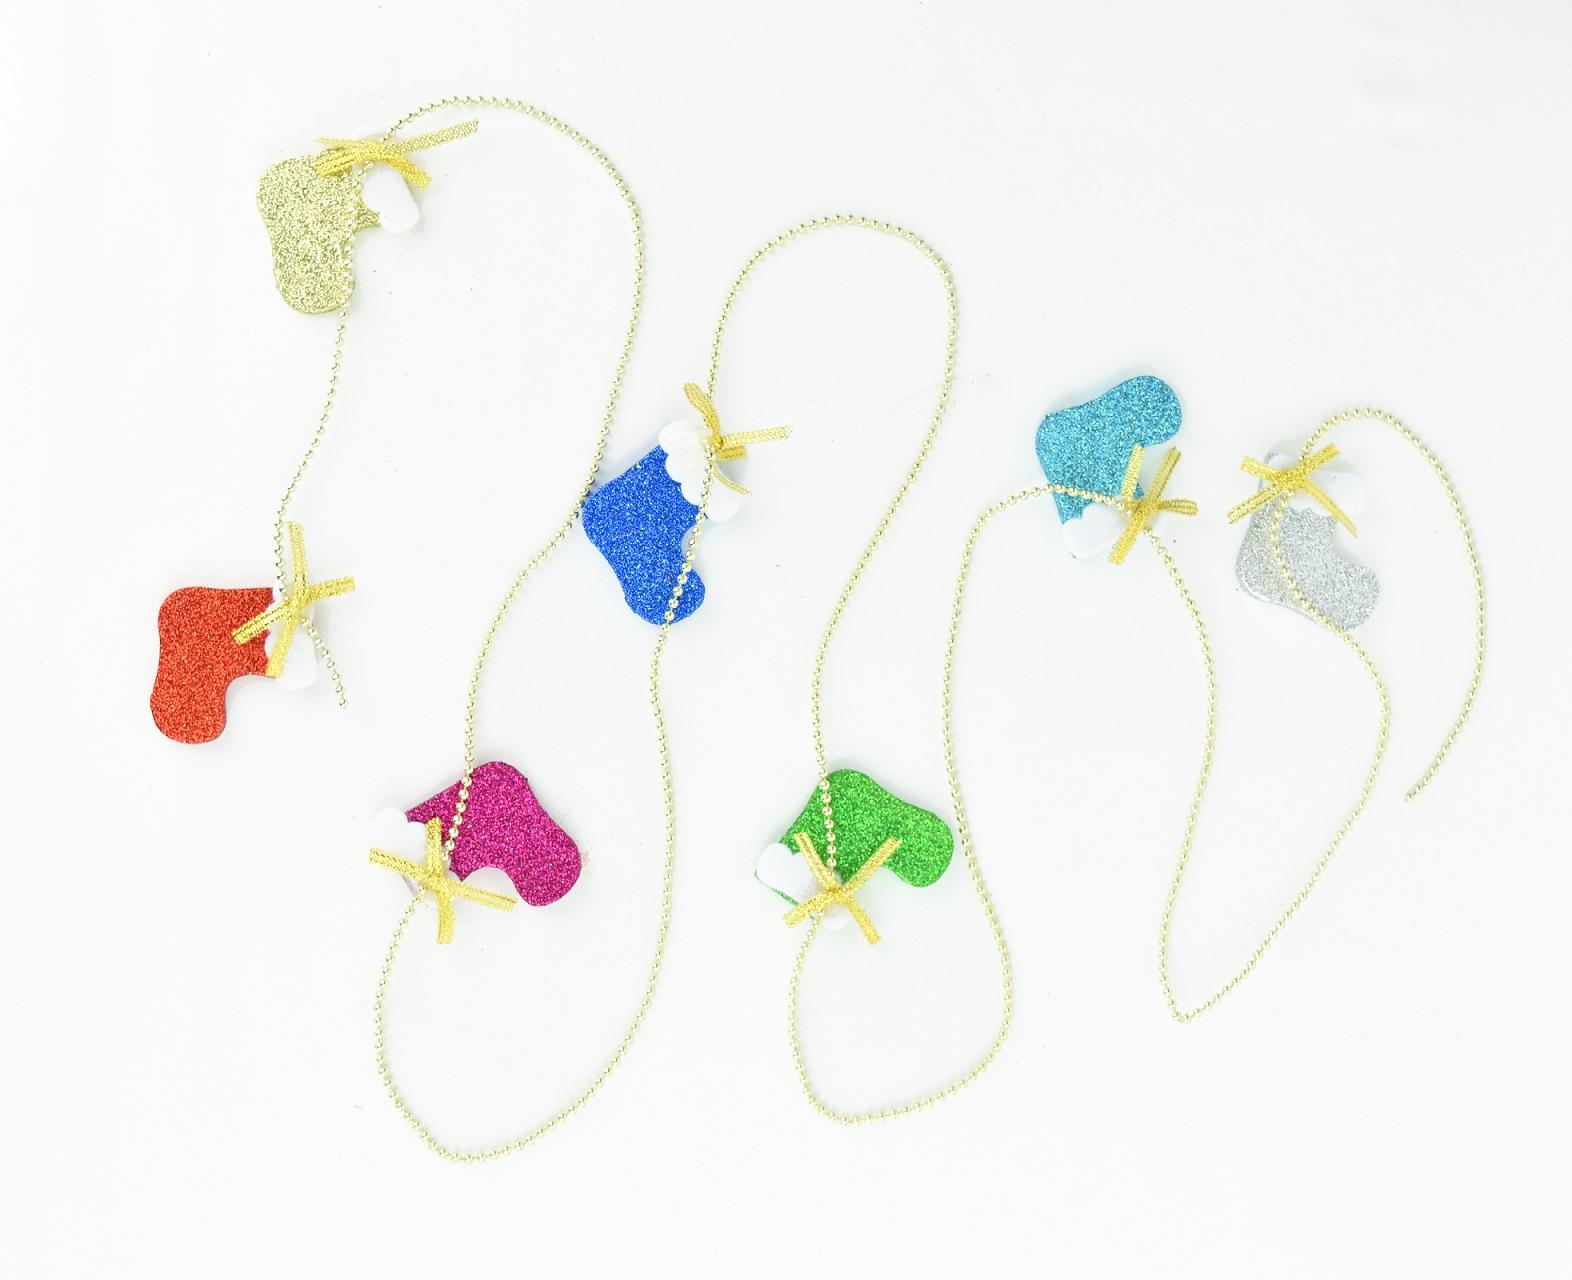 X射線【X299636】金粉彩色聖誕襪鍊珠條,聖誕節/聖誕樹/聖誕佈置/聖誕掛飾/裝飾/掛飾/會場佈置/DIY/材料包